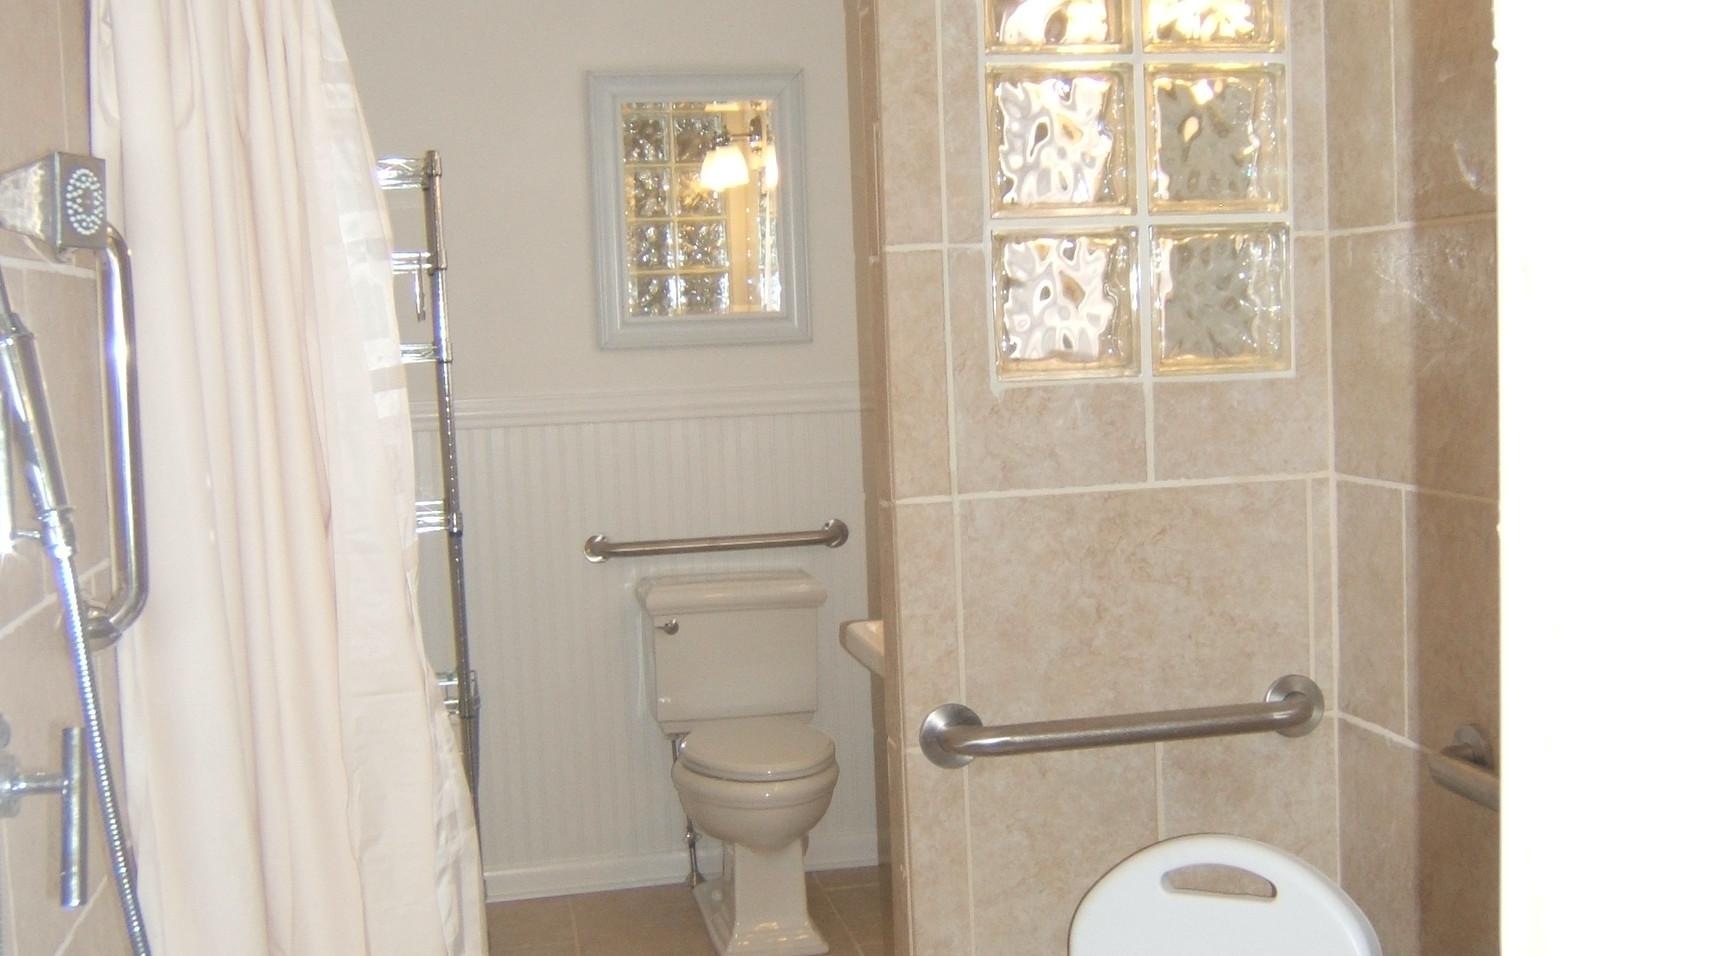 bathroom Roudabush 009.jpg